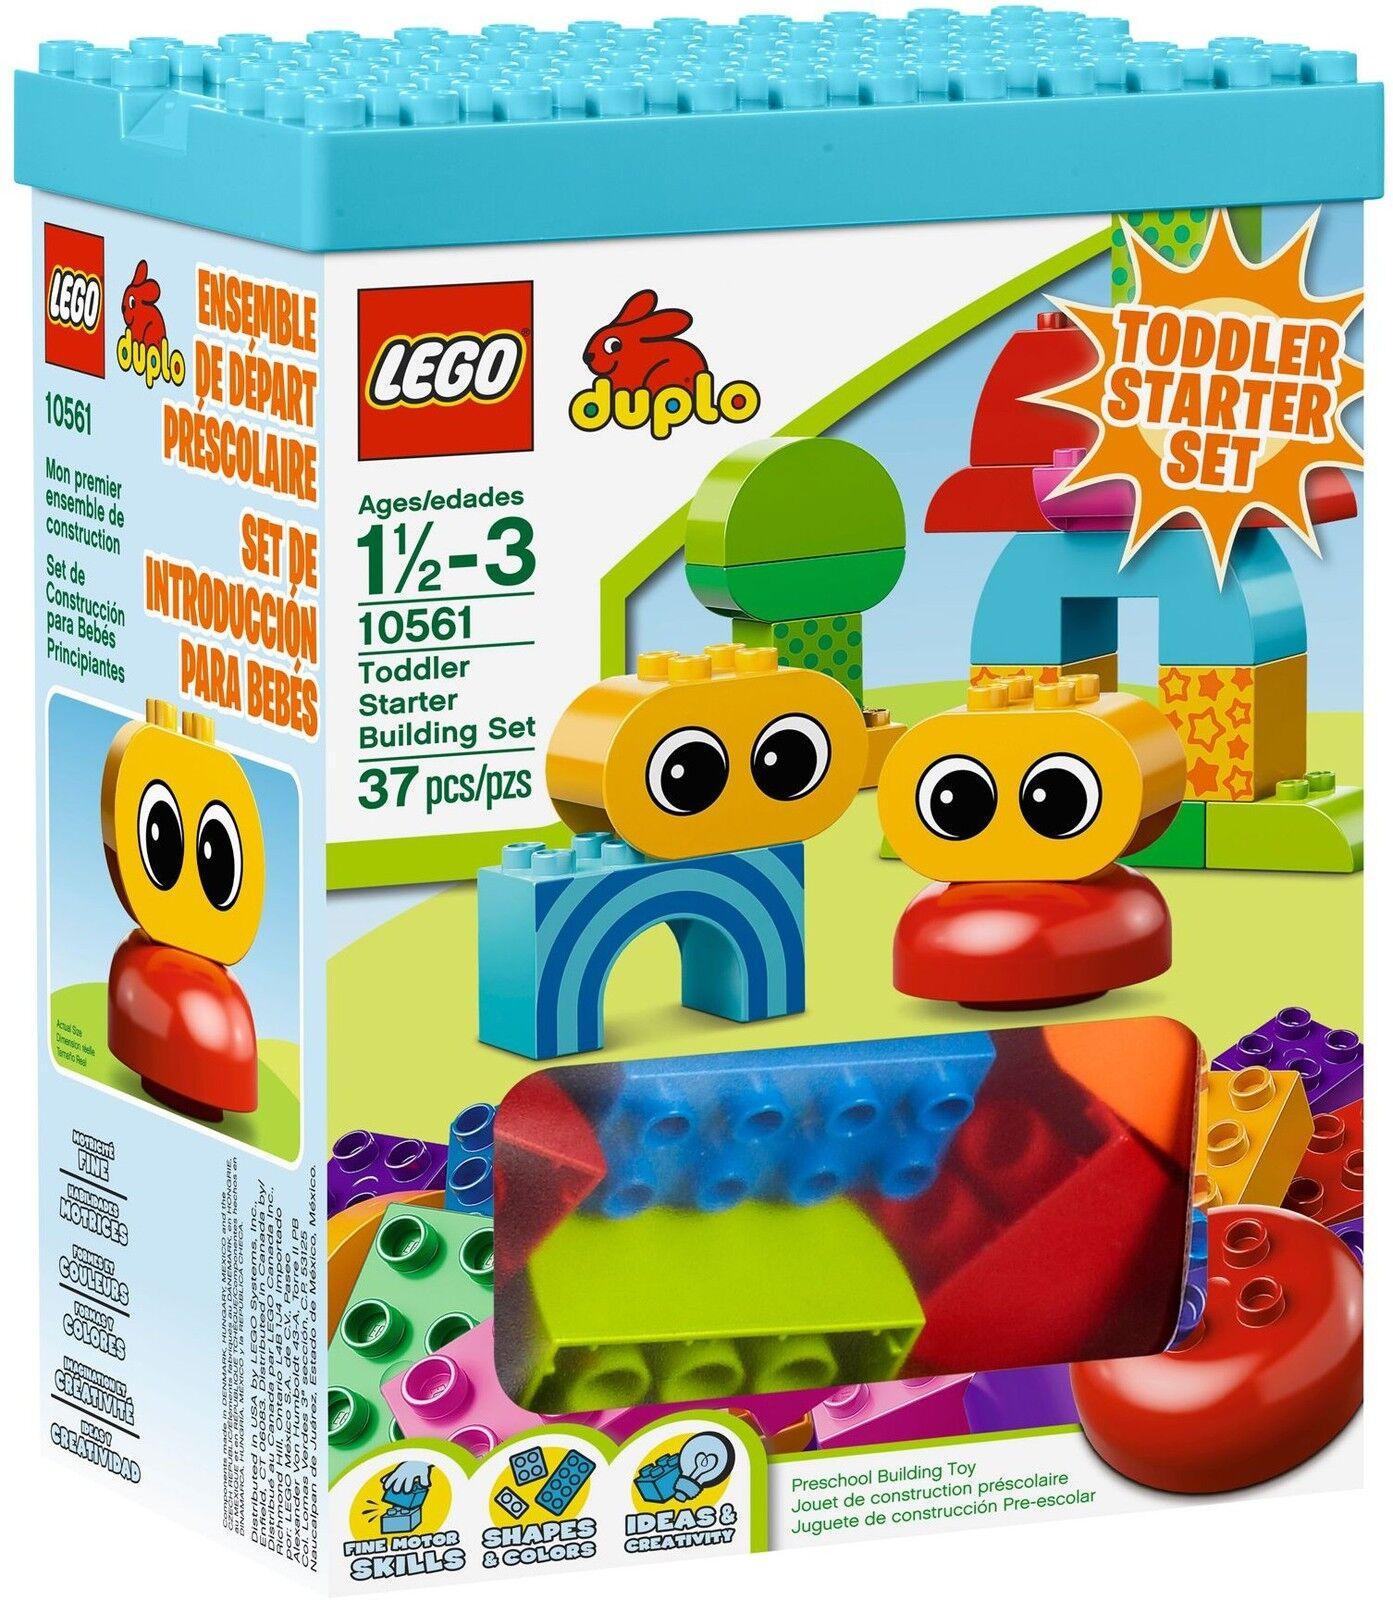 Lego Duplo 10561 Toddler Starter Building set BNIB mint educational construction